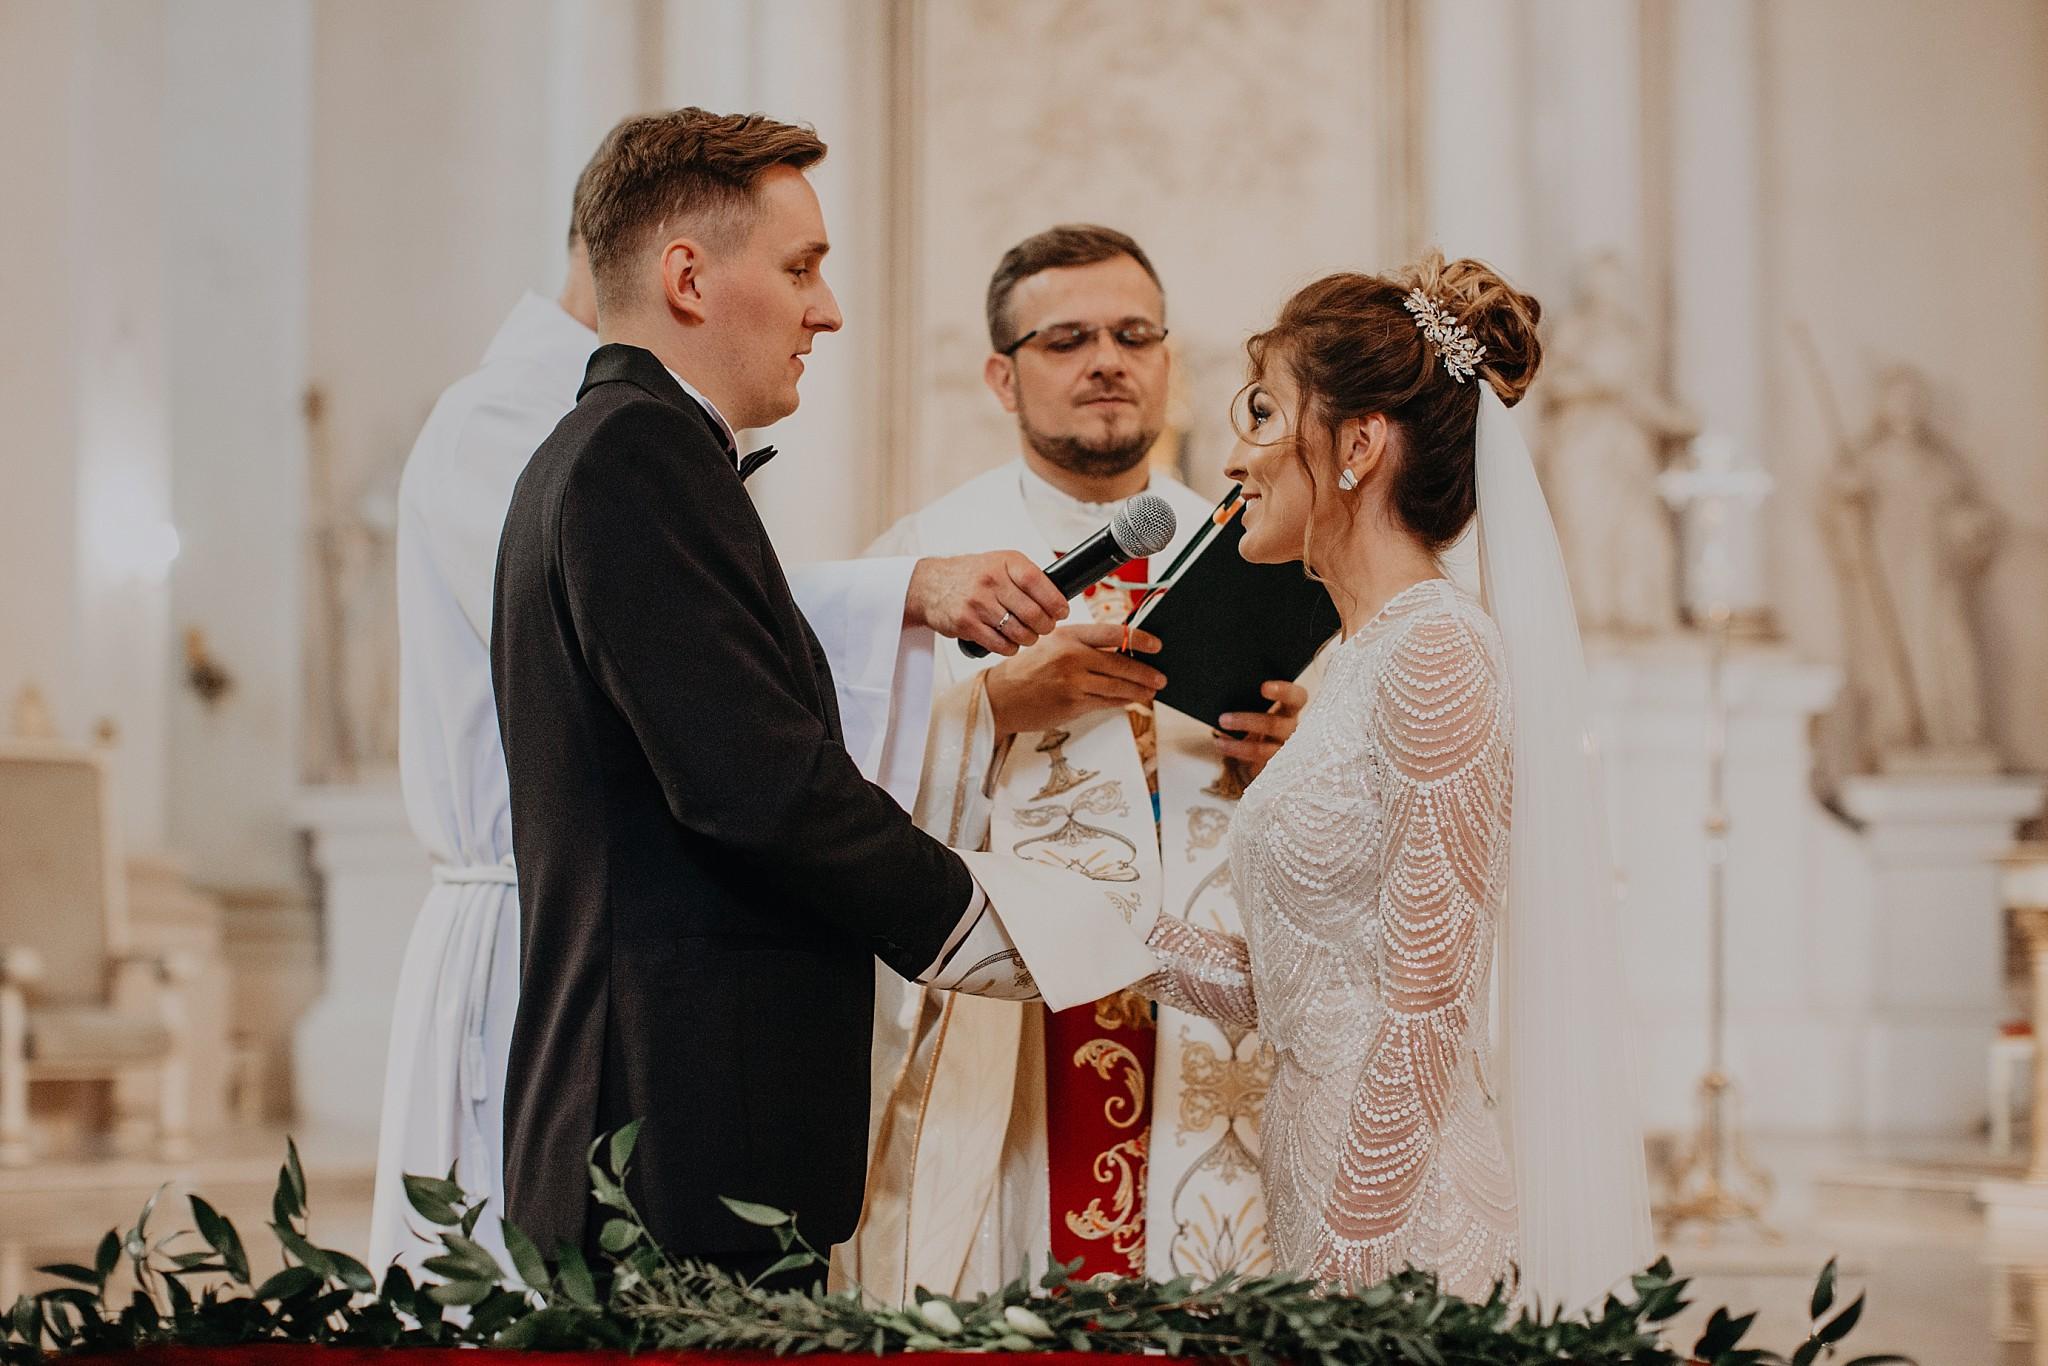 fotograf poznan wesele dobra truskawka piekne wesele pod poznaniem wesele w dobrej truskawce piekna para mloda slub marzen slub koronawirus slub listopad wesele koronawirus 174